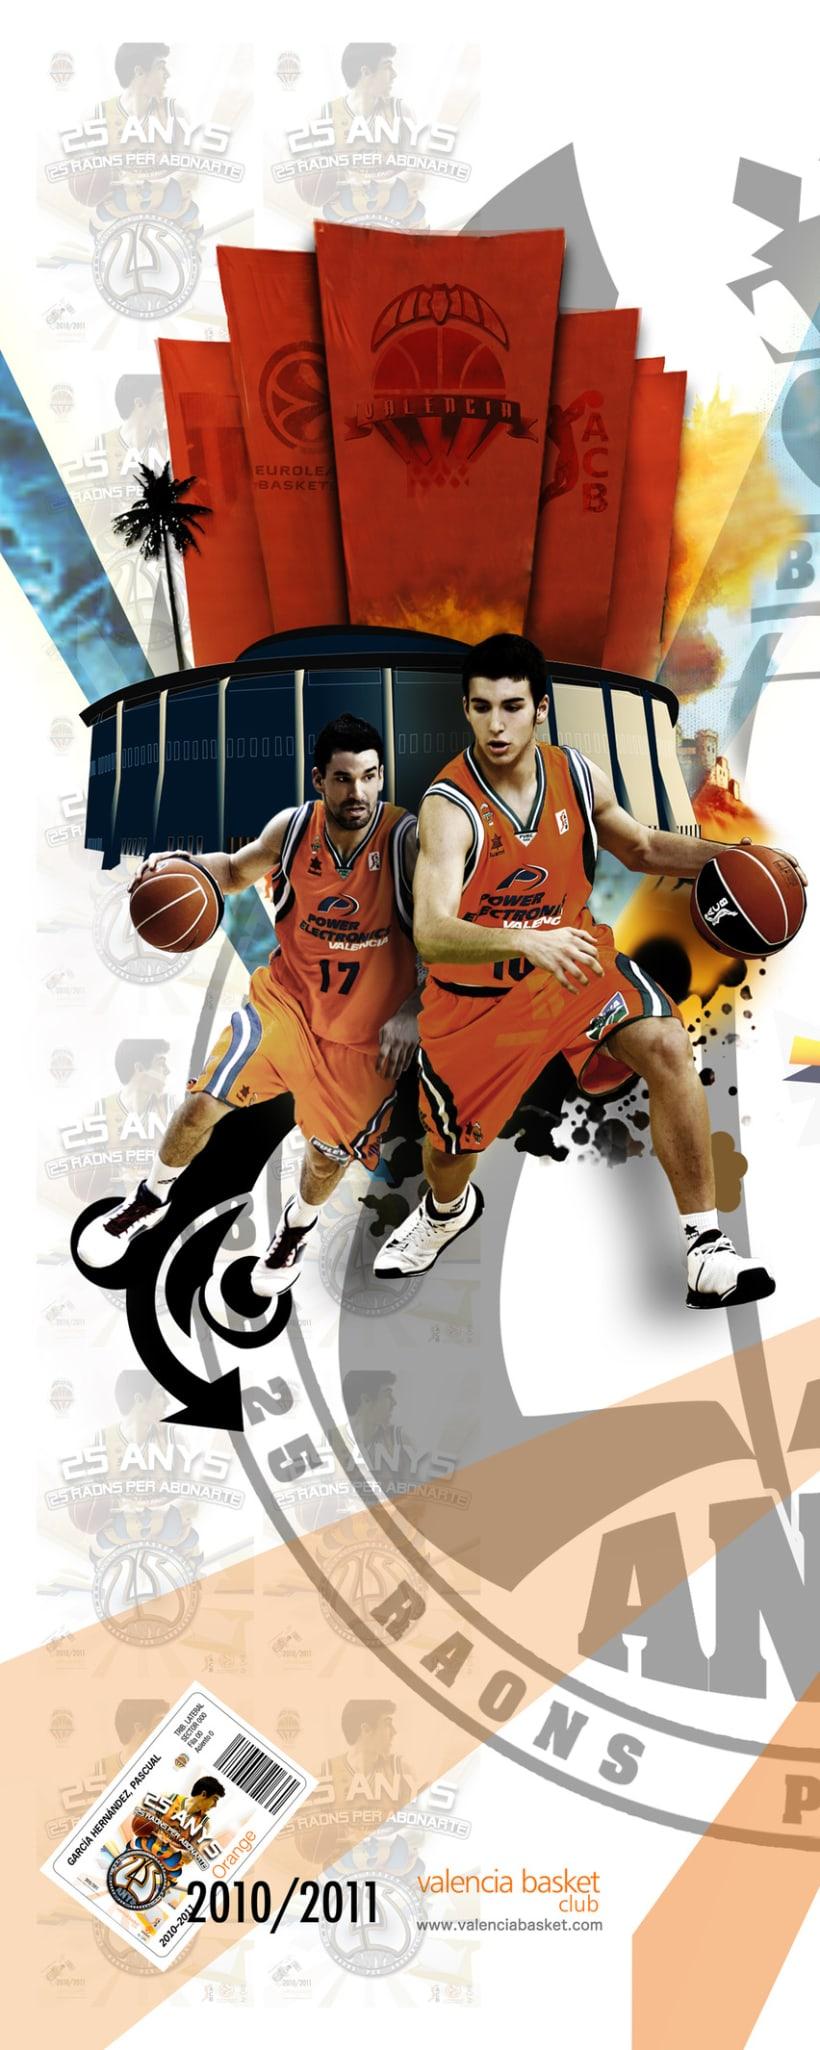 25 Aniversari Valencia Basket 3